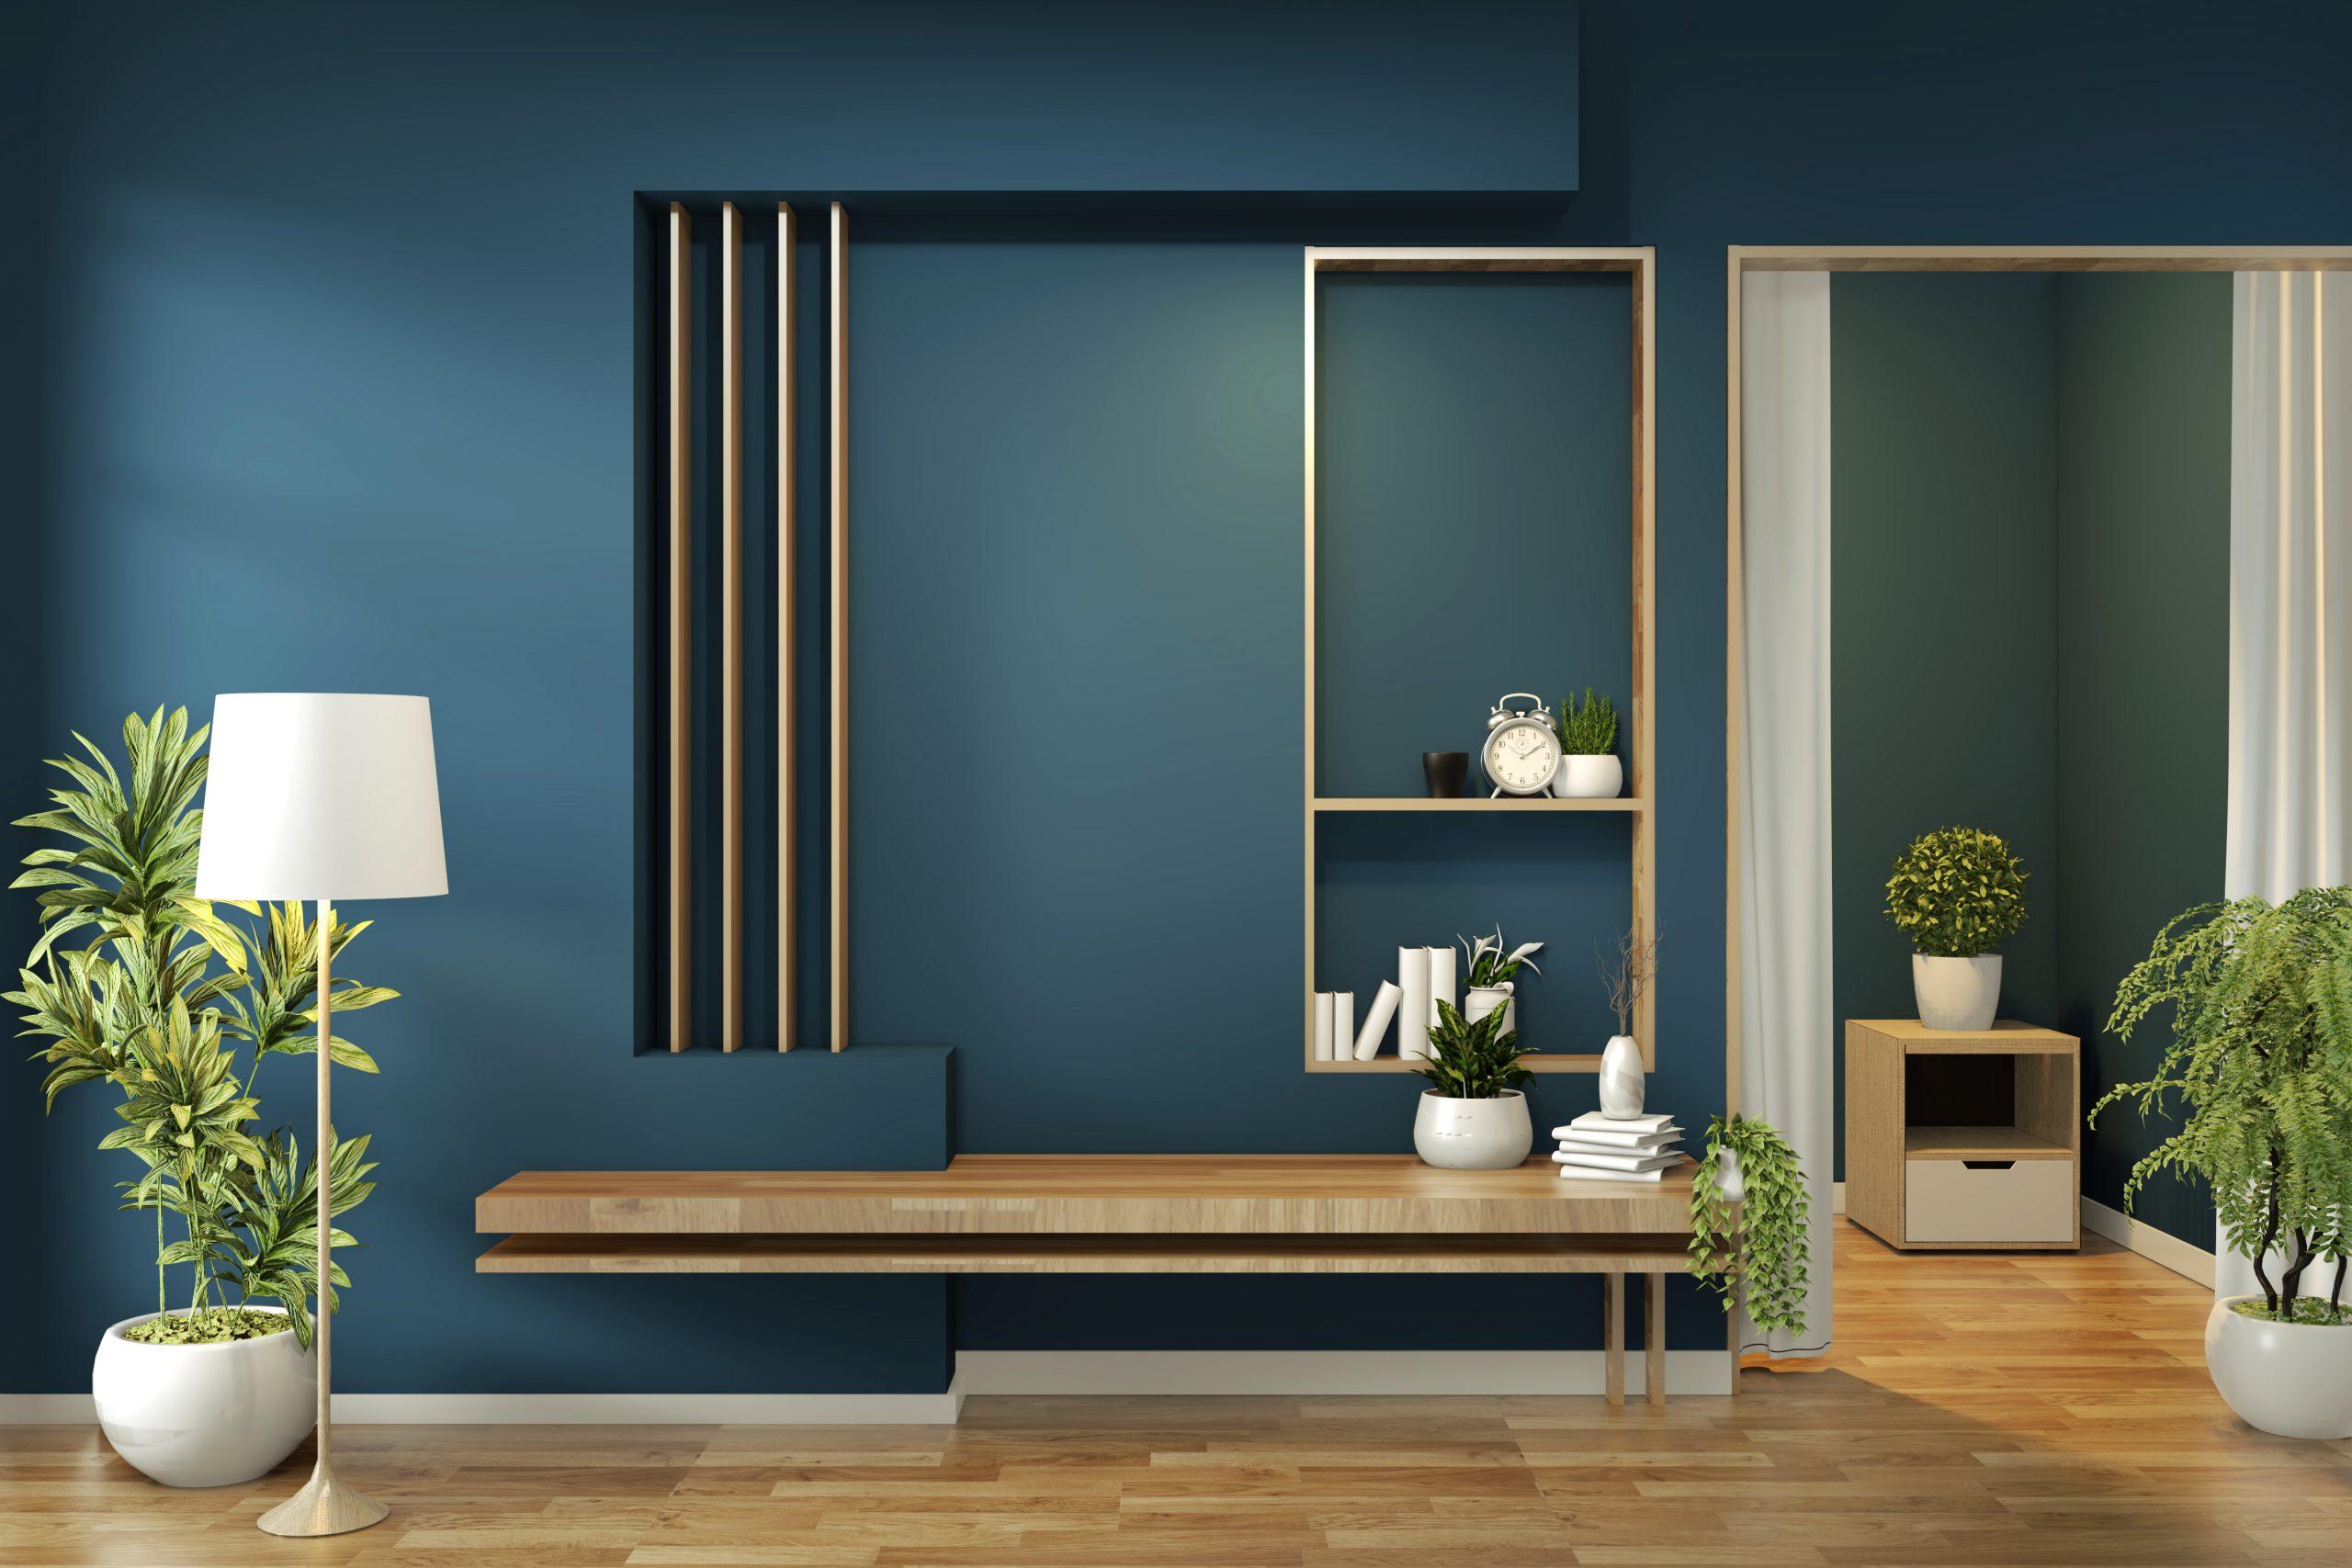 cabinet mock up on room dark blue on floor wooden minimal design.3D rendering